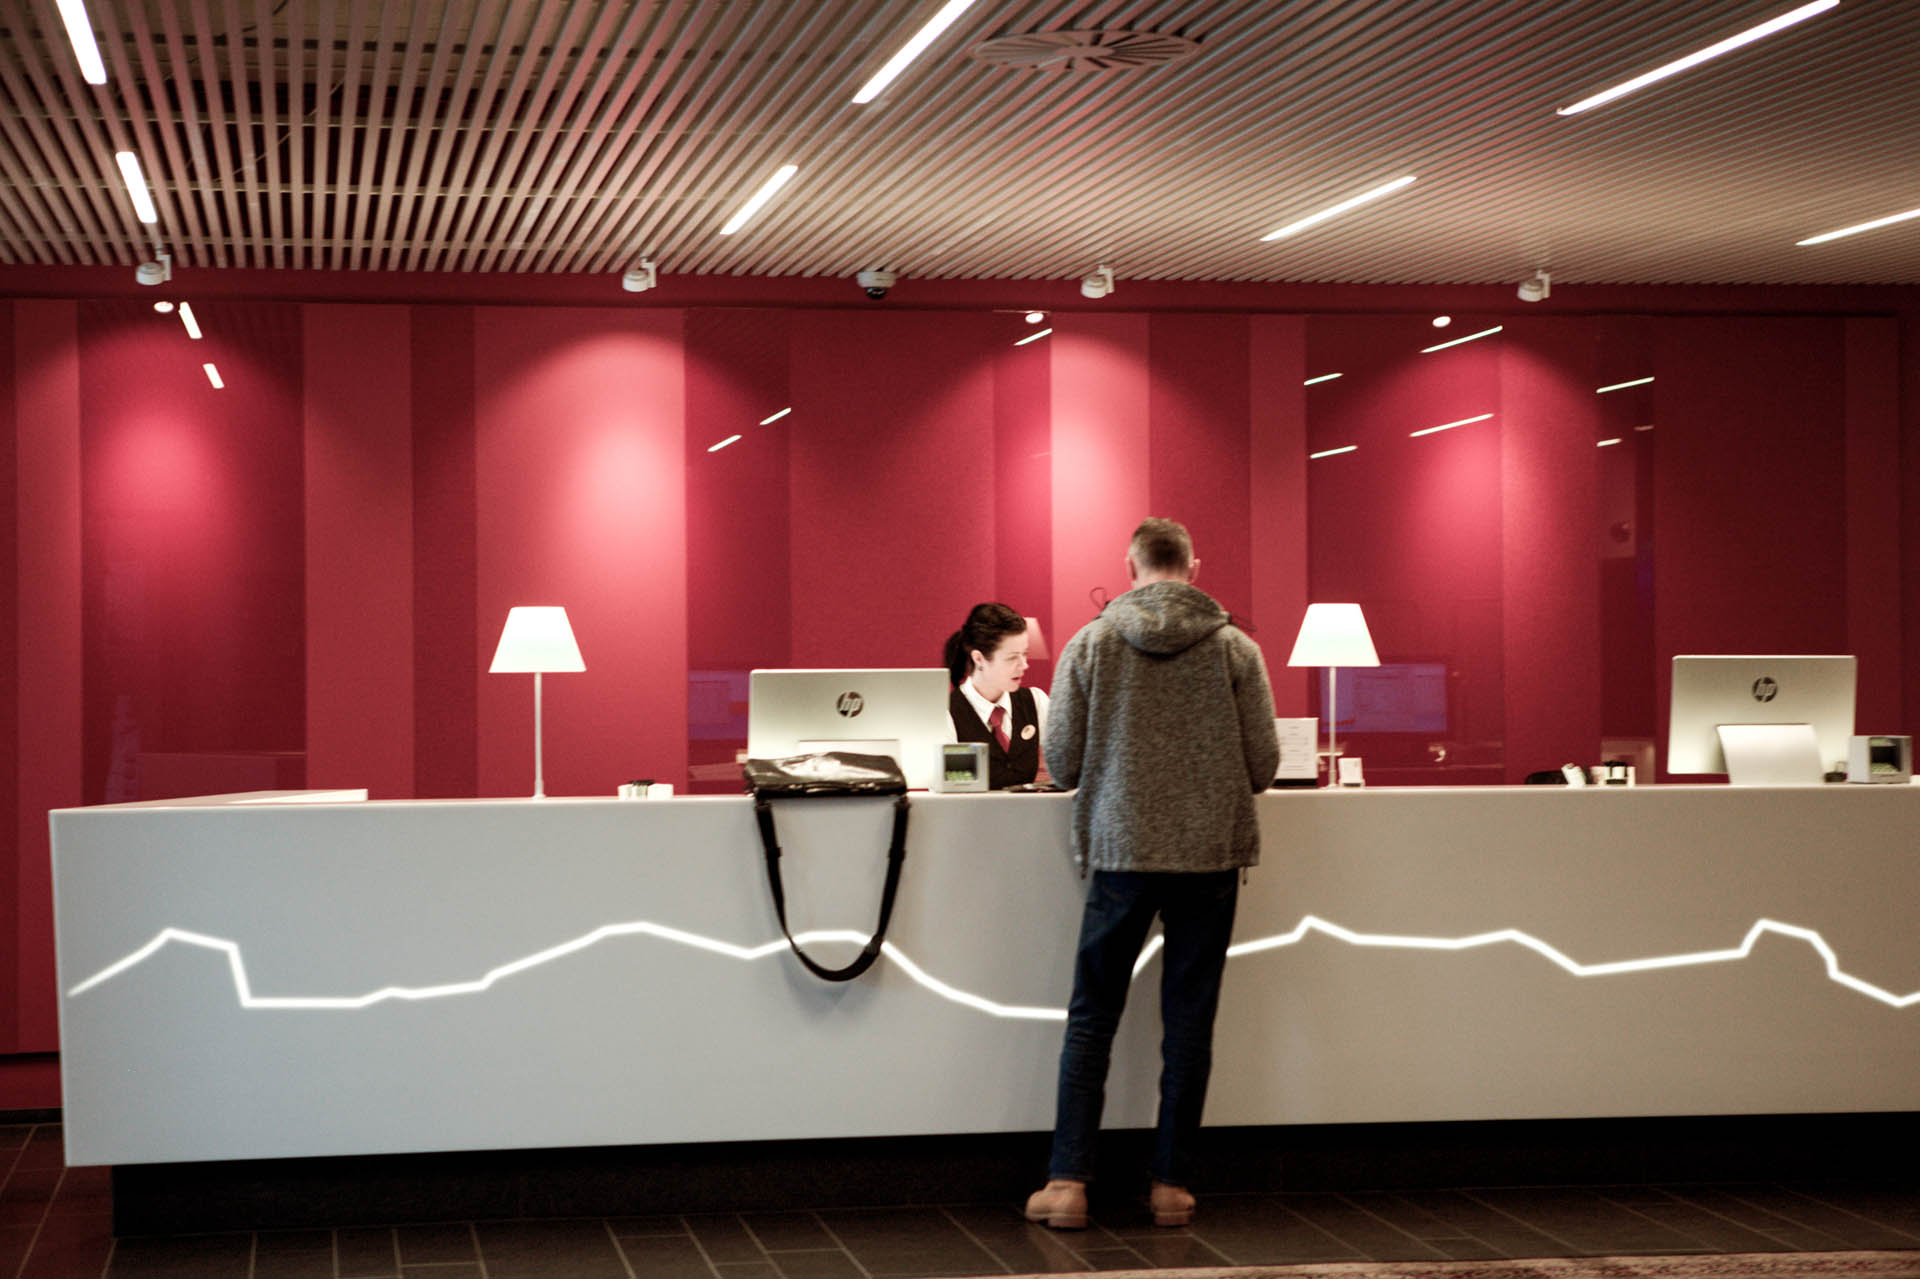 Reception frontdesk